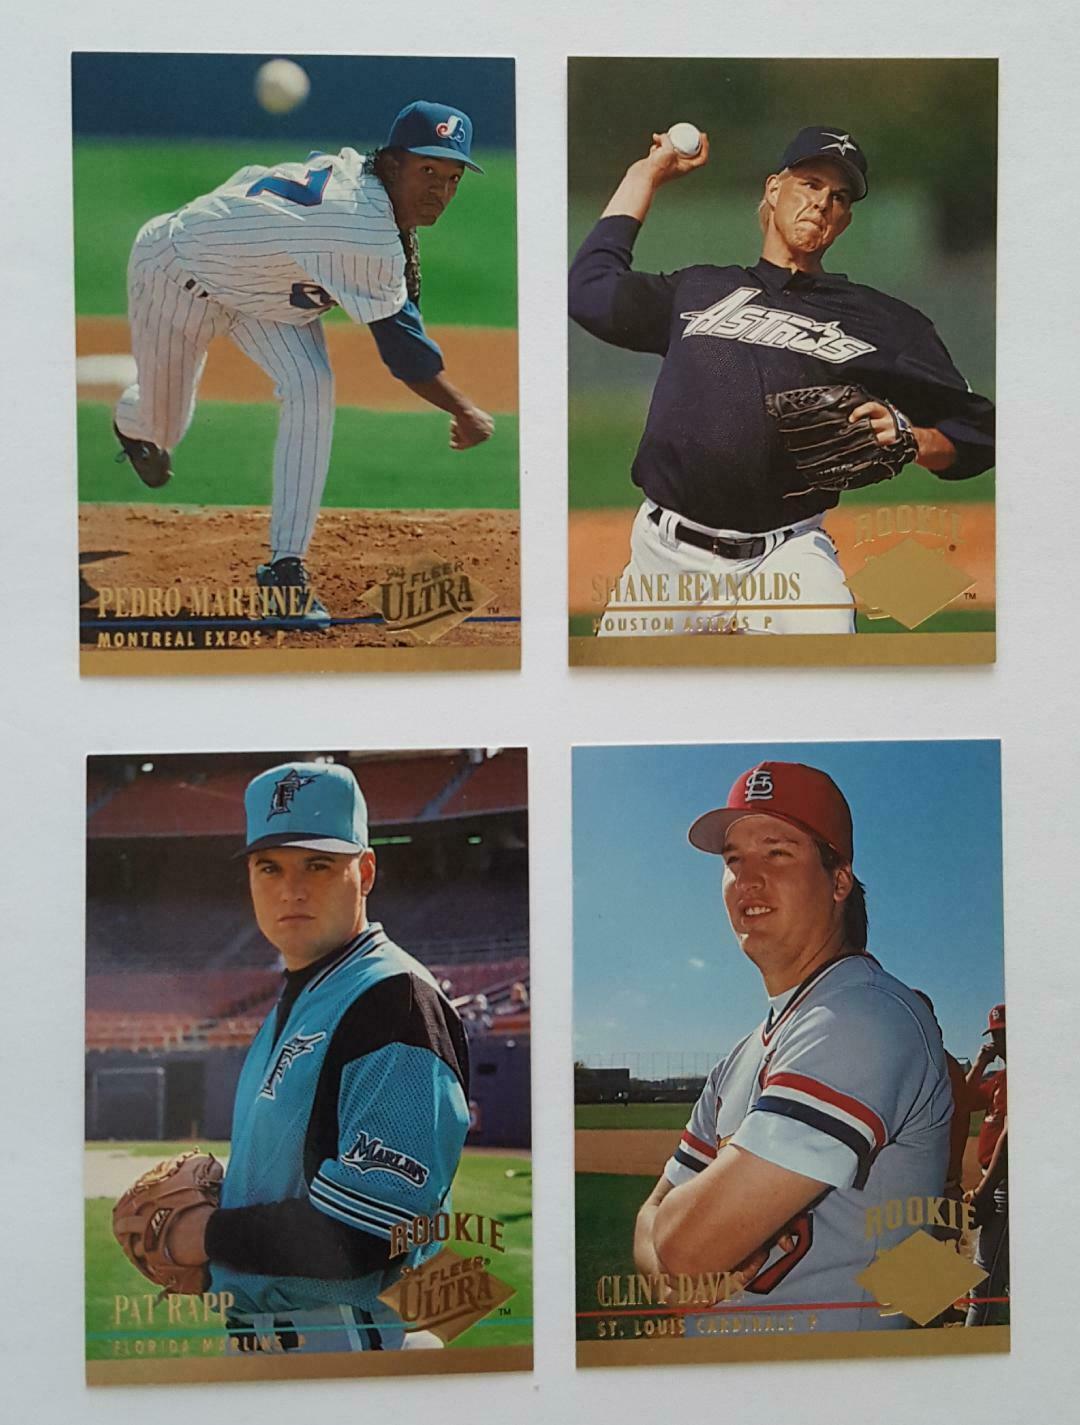 1994 Fleer Ultra + Rookie Card Lot NM Cond w/ Pat Ripp, Clint Davis, Nice Cards